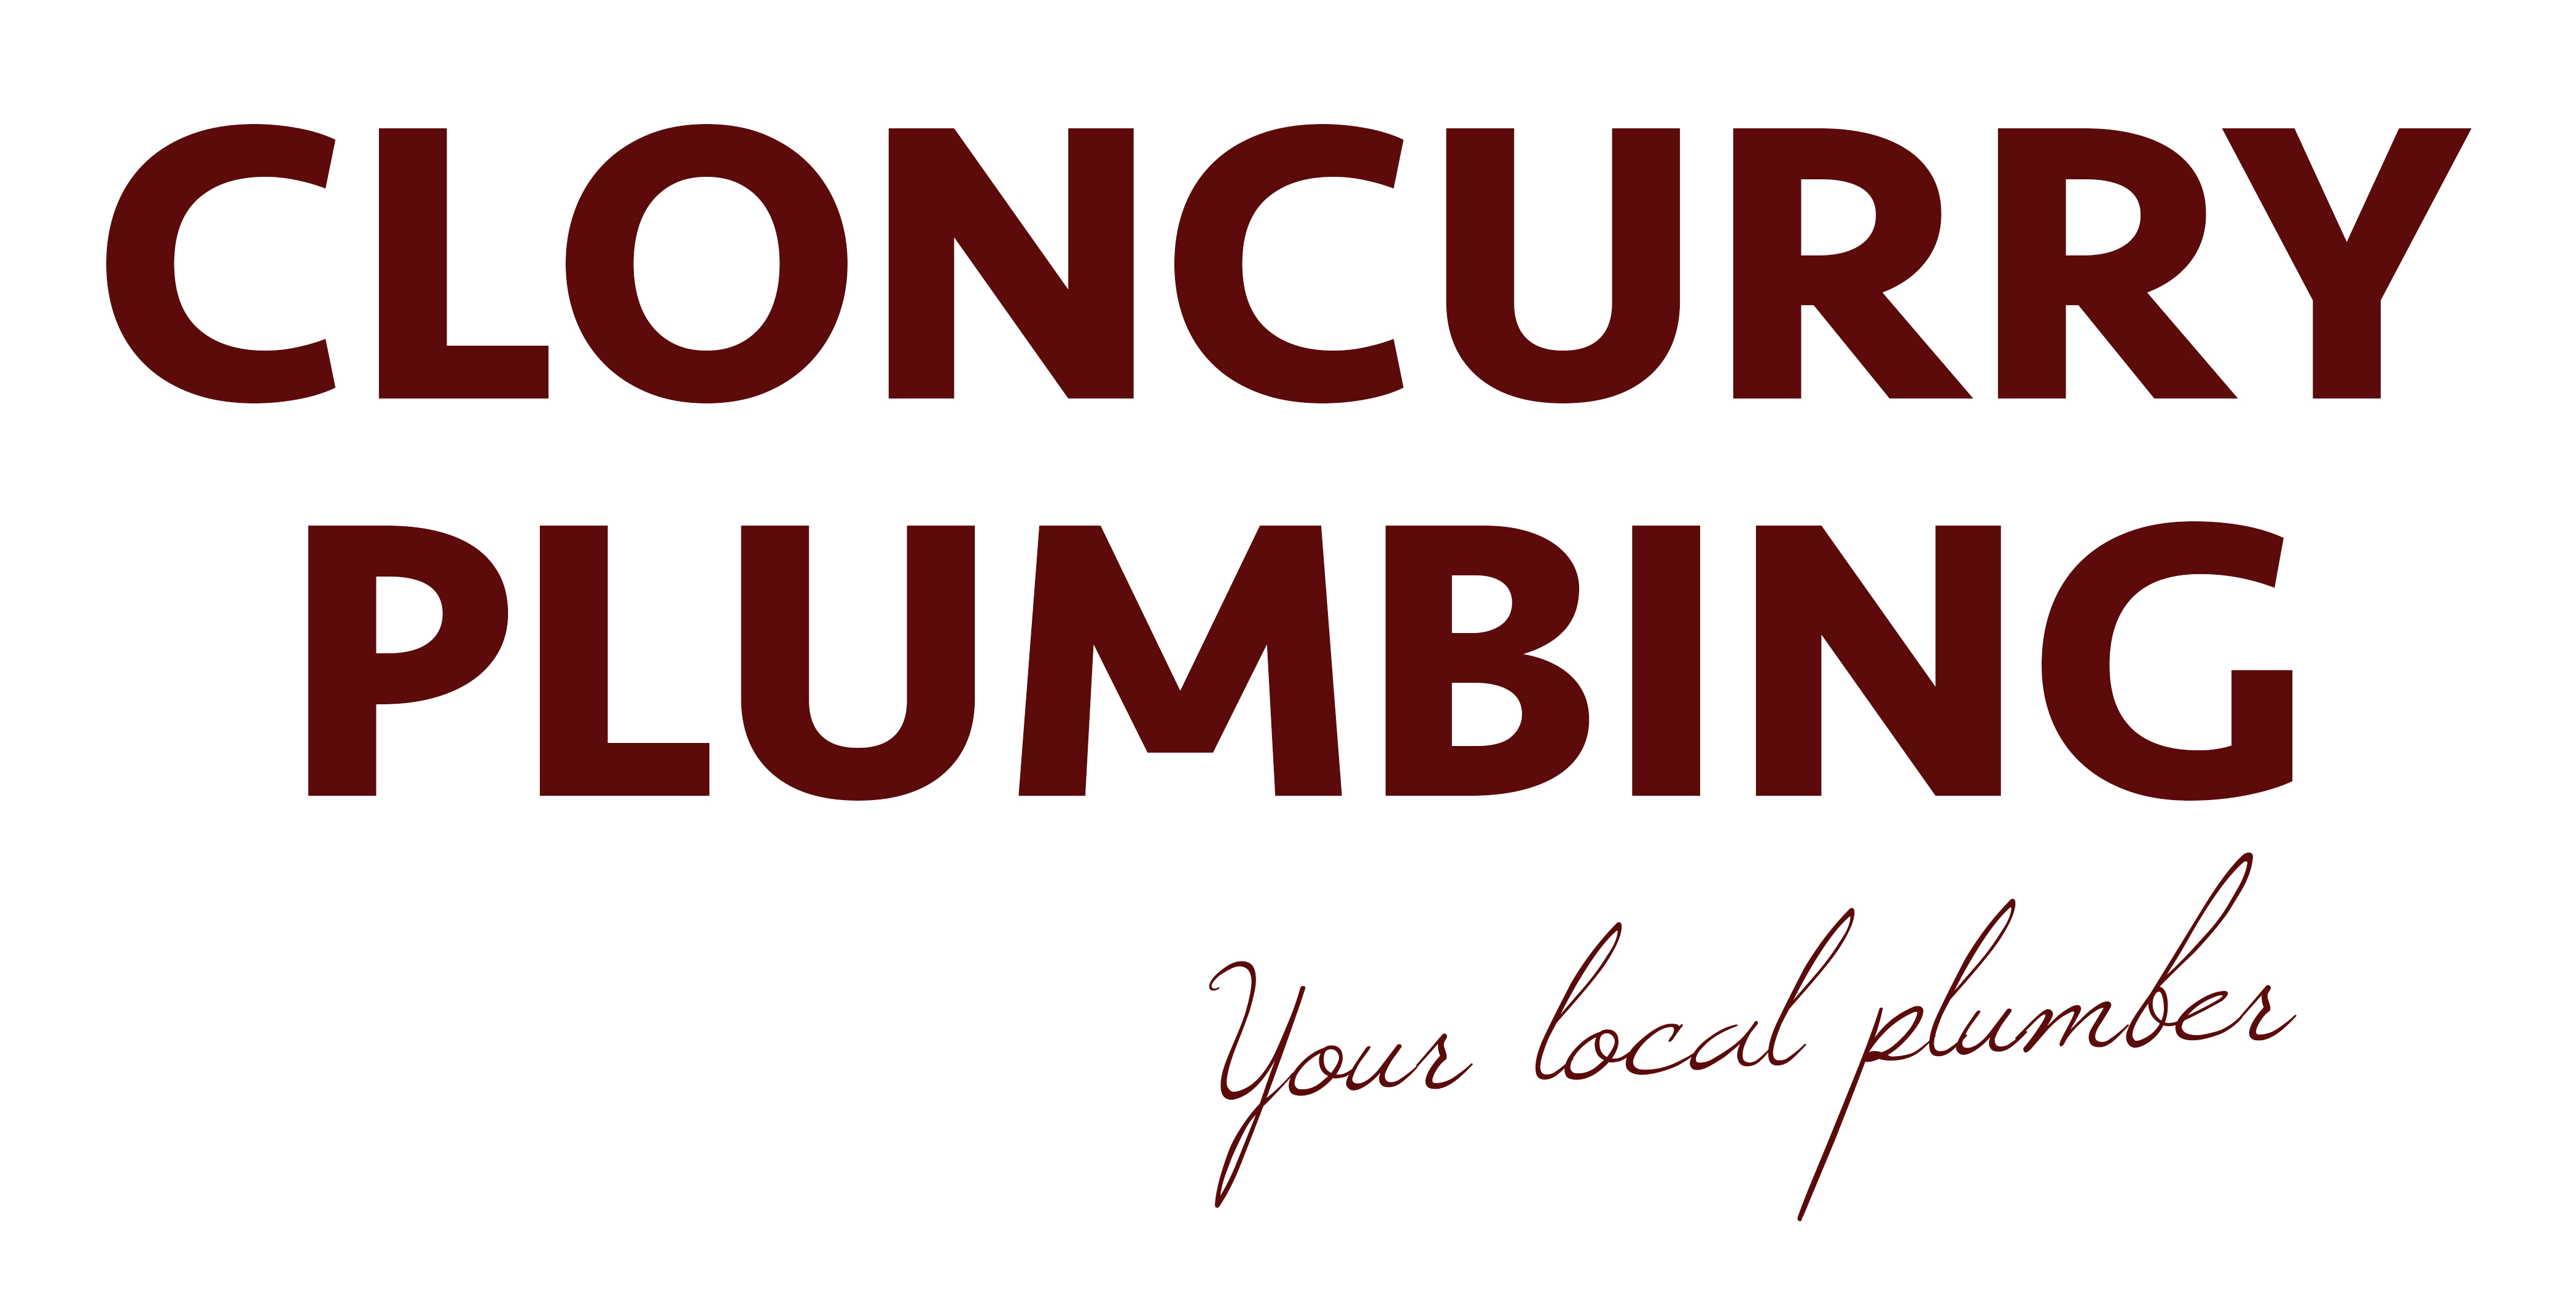 Cloncurry Plumbing Final